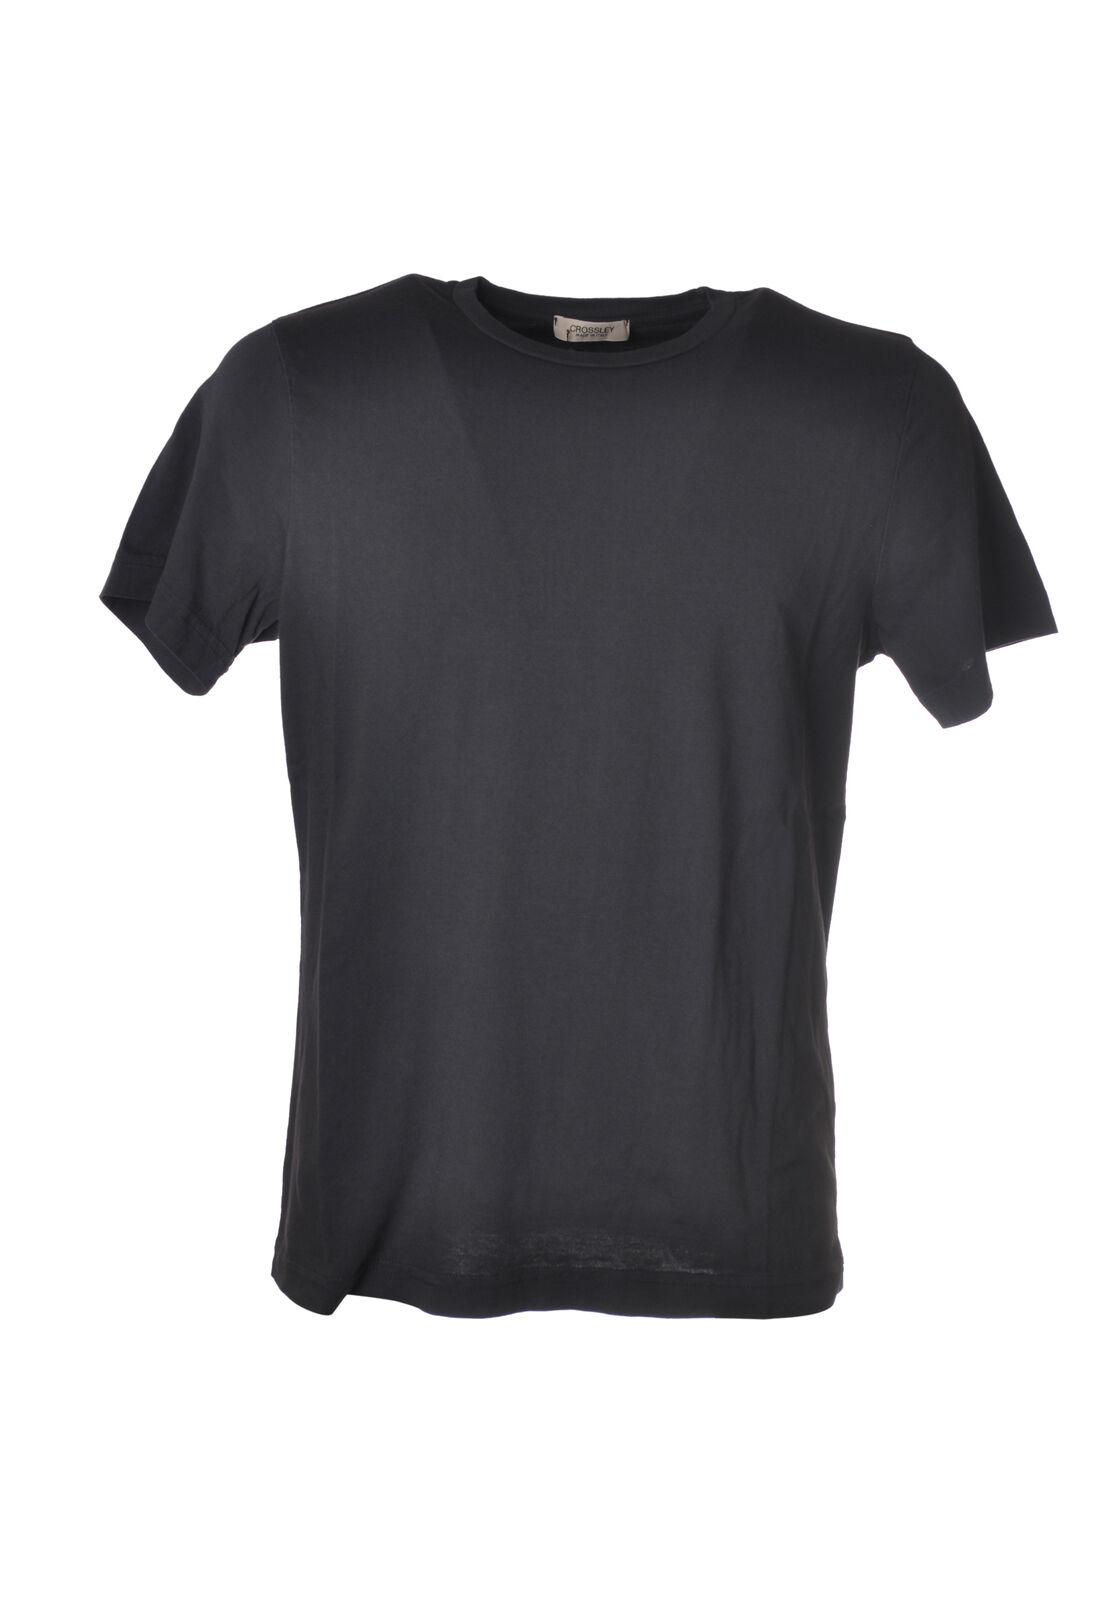 CROSSLEY - Topwear-T-shirts -  Herren - Blu - 5552925I184854